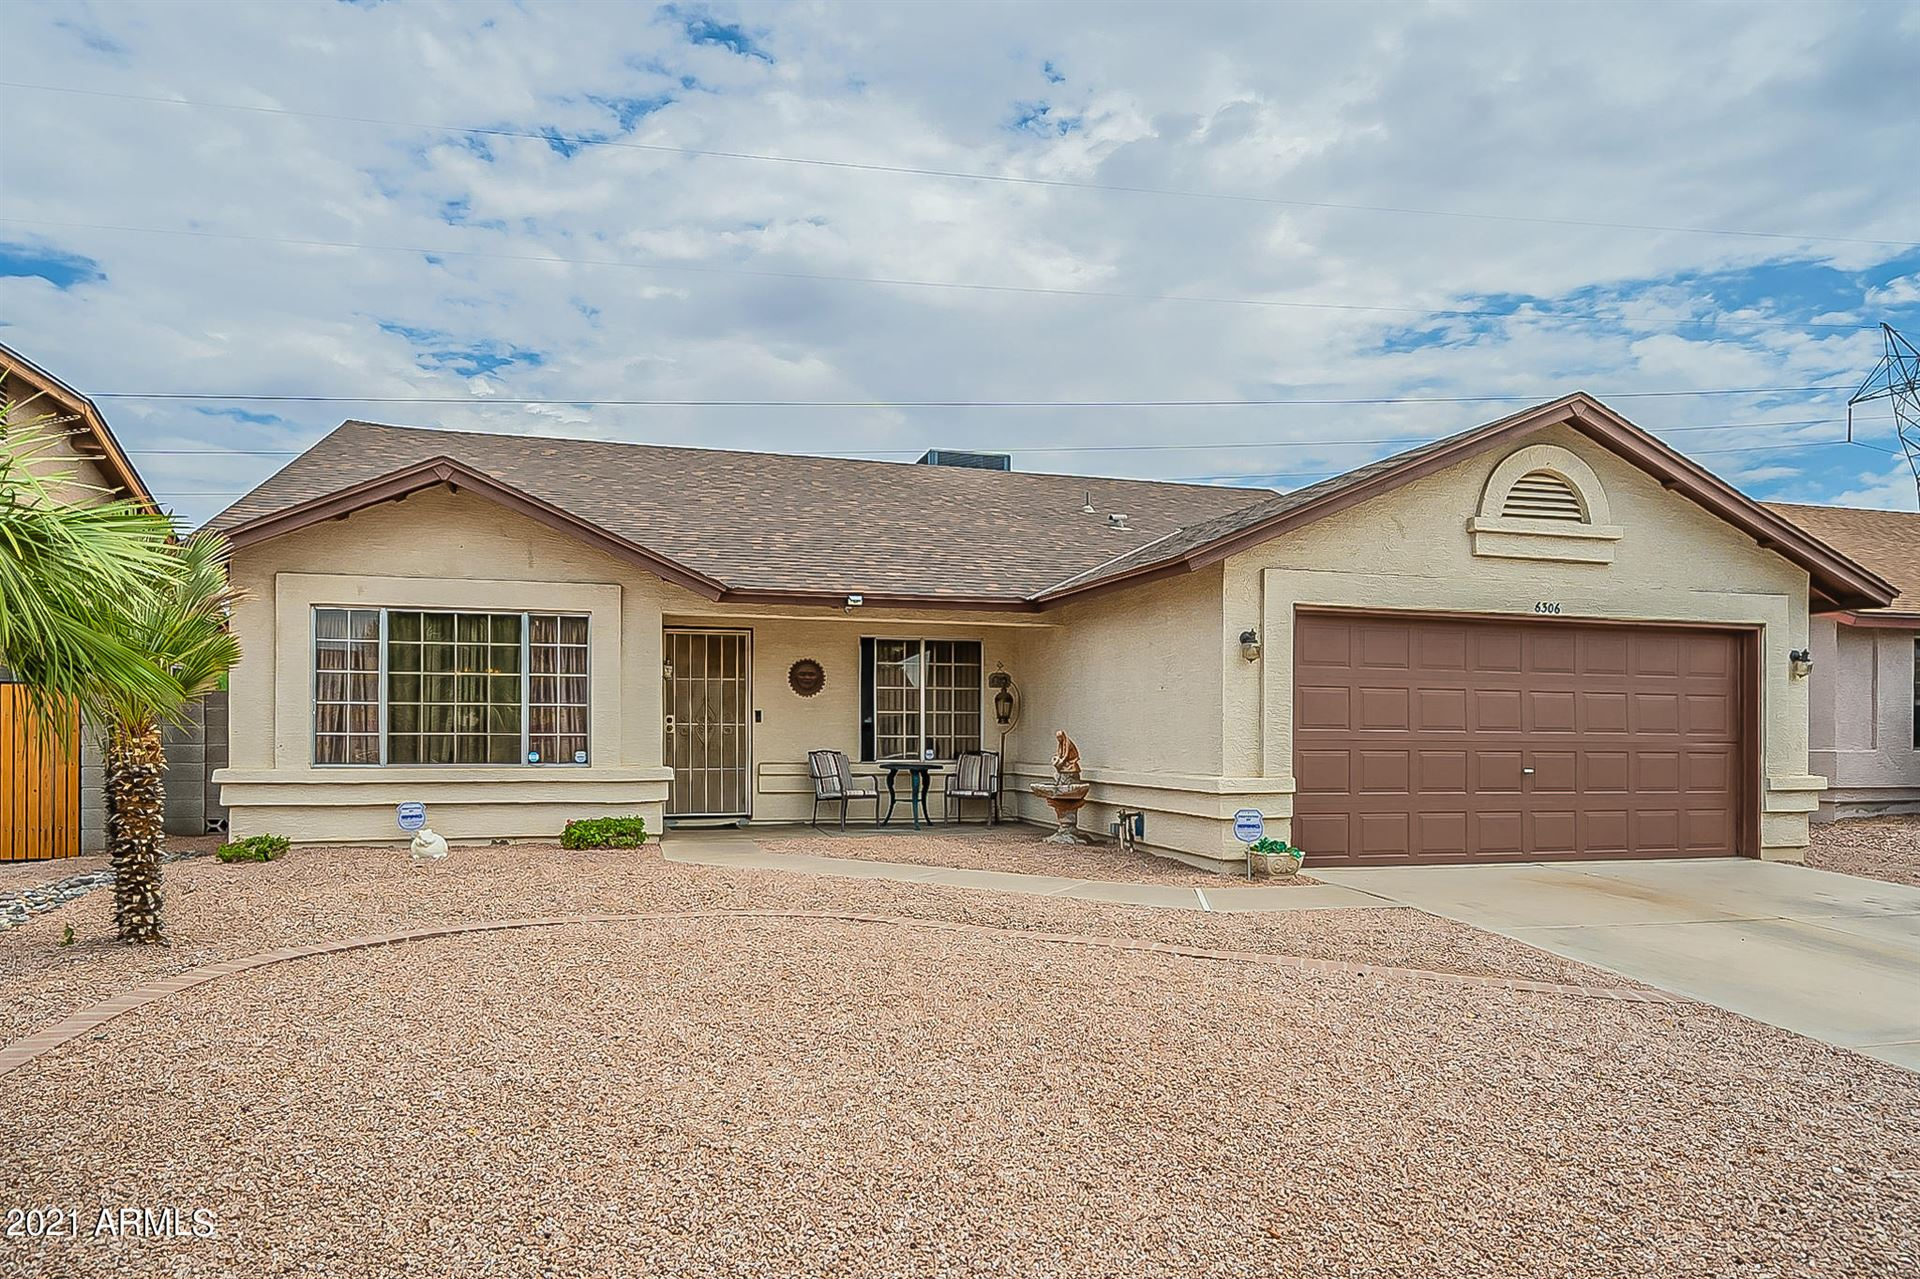 6306 E COLBY Street, Mesa, AZ 85205 - MLS#: 6260224